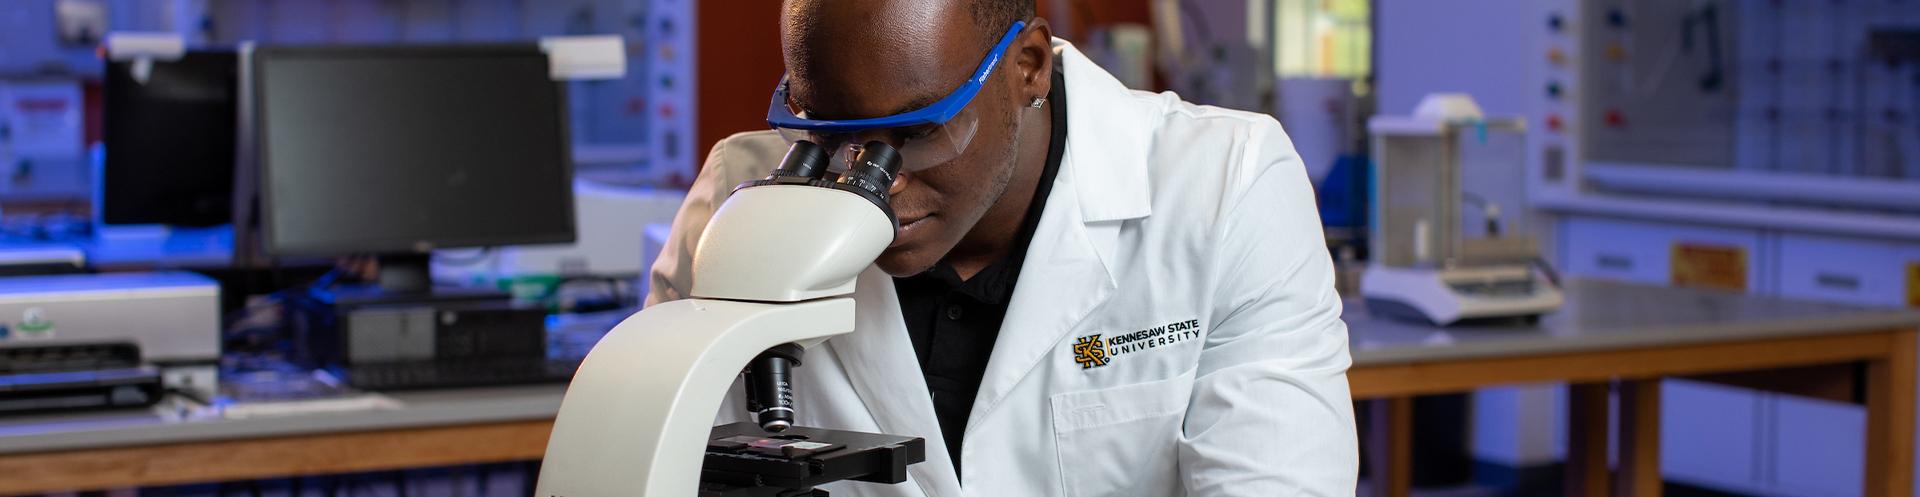 Kennesaw State's Advanced Majors Program provides support for STEM education